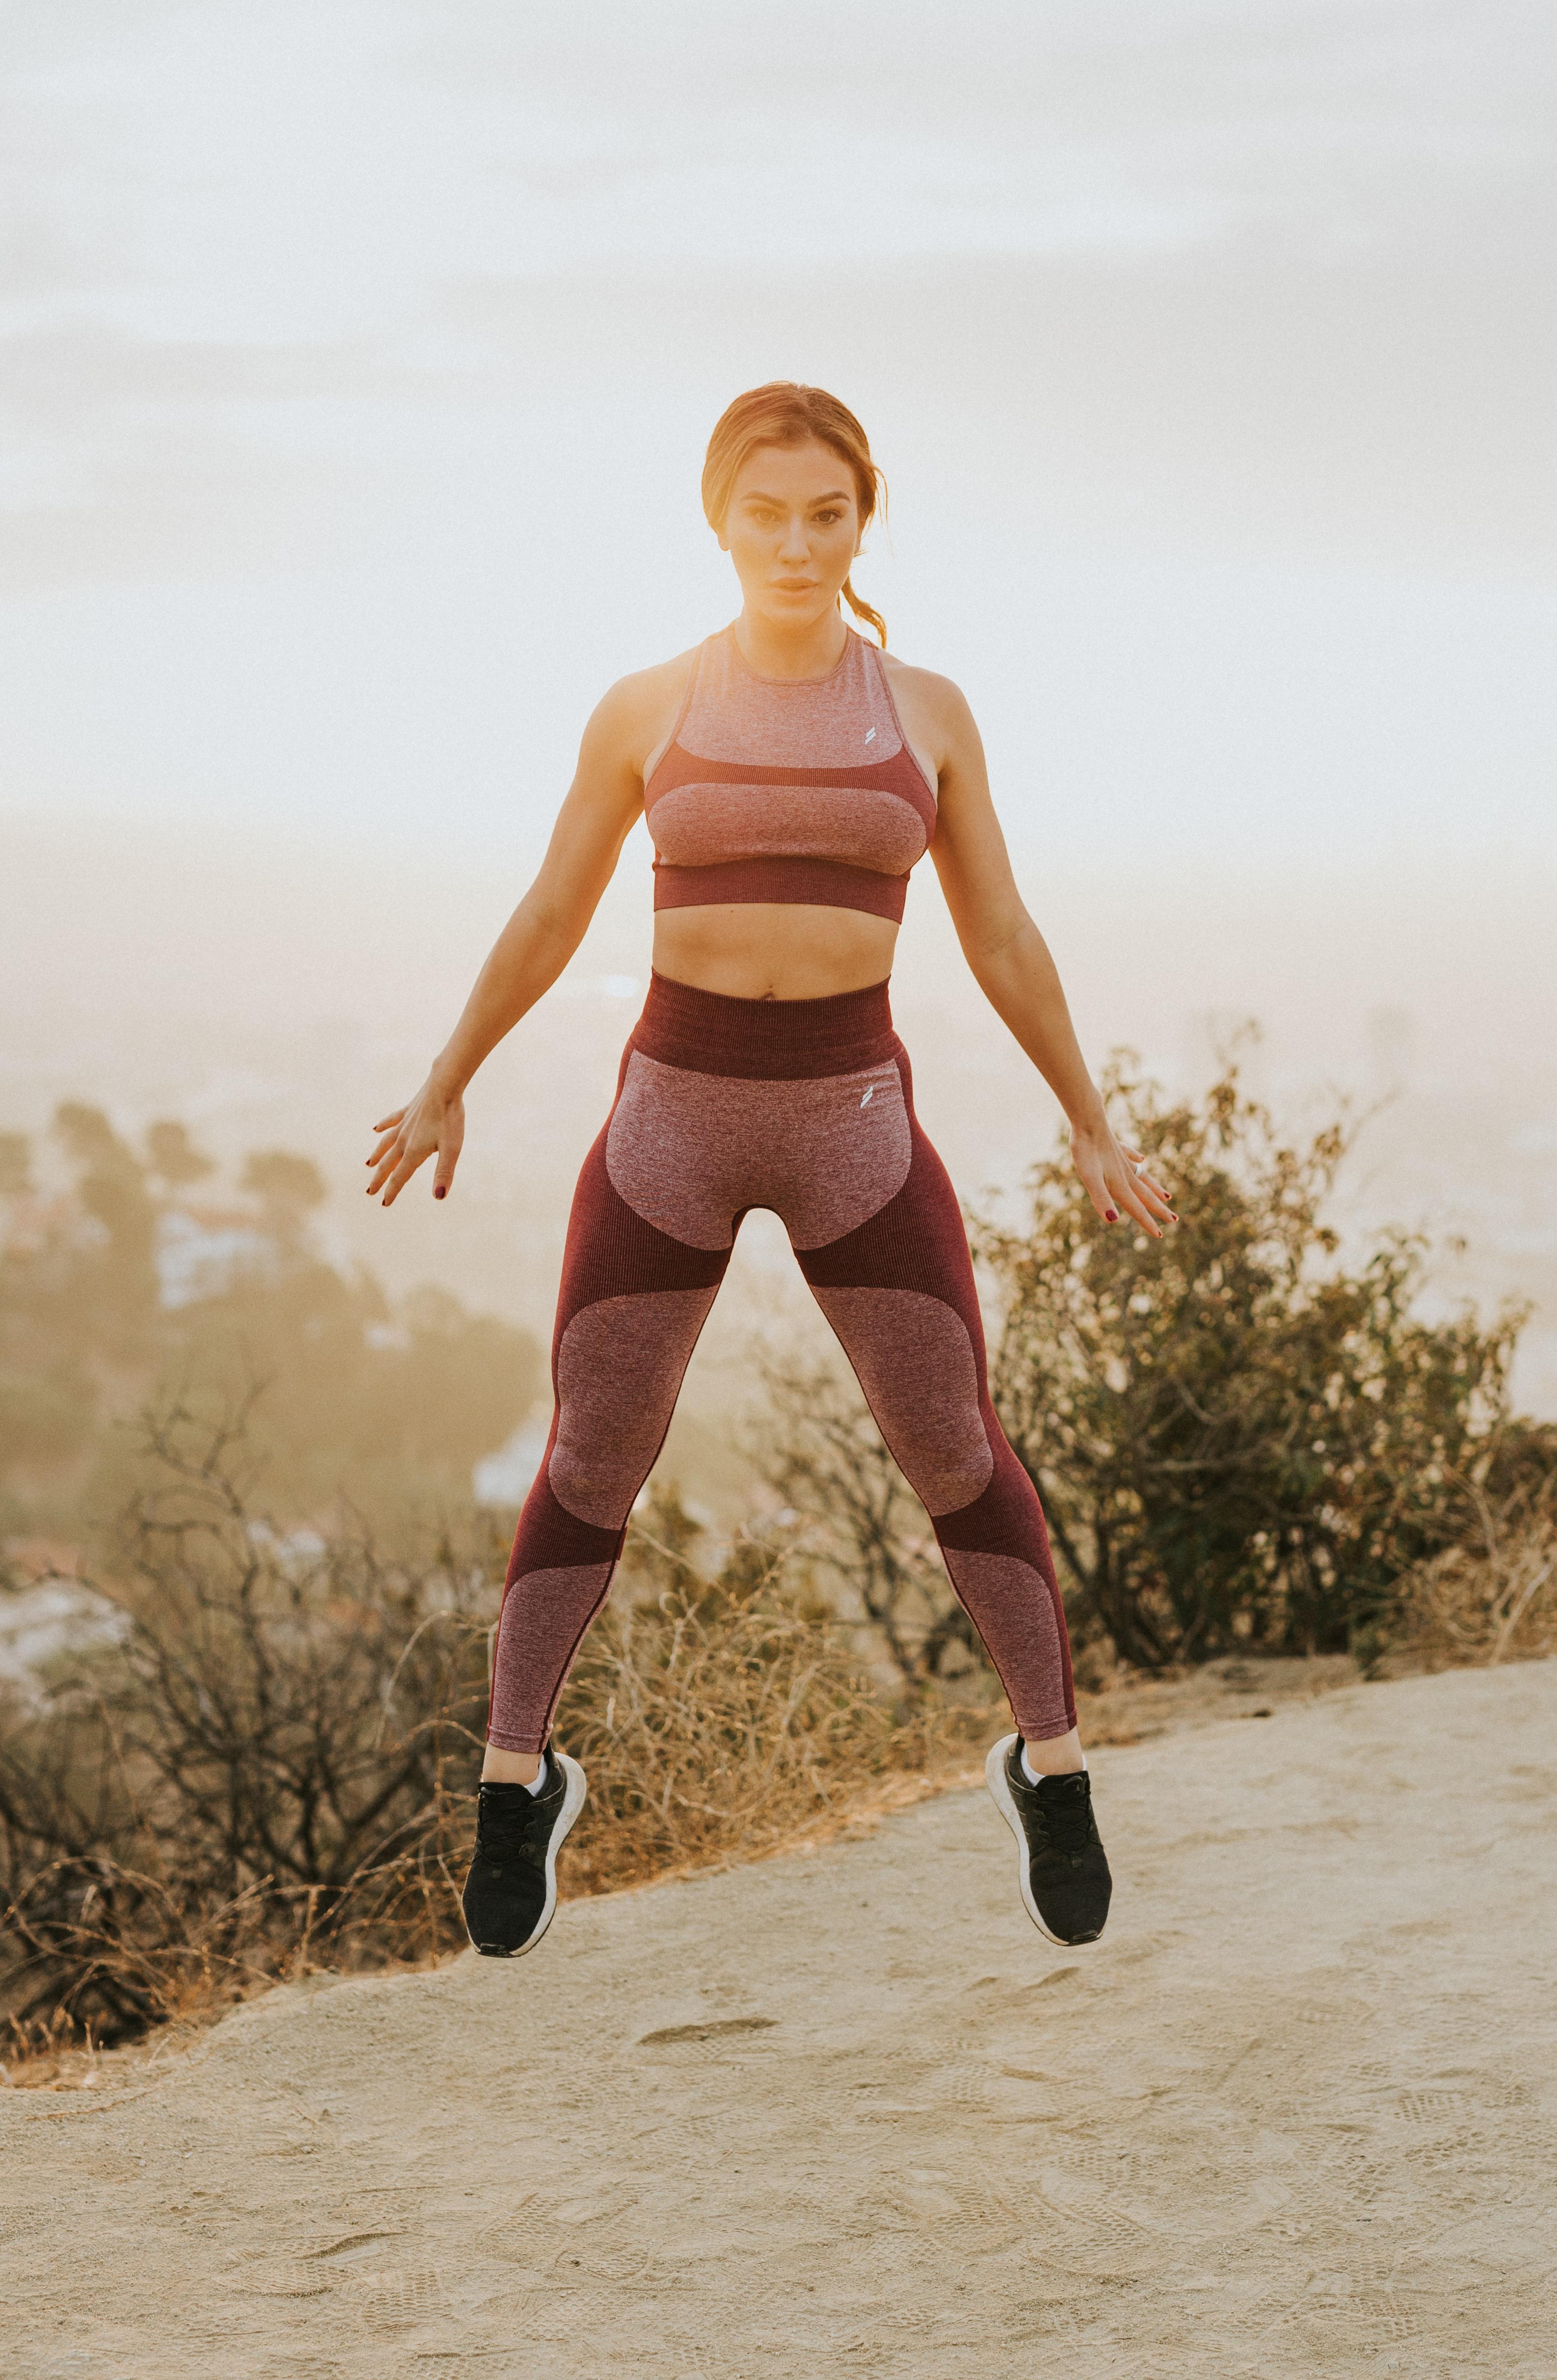 Sportive woman jumping.